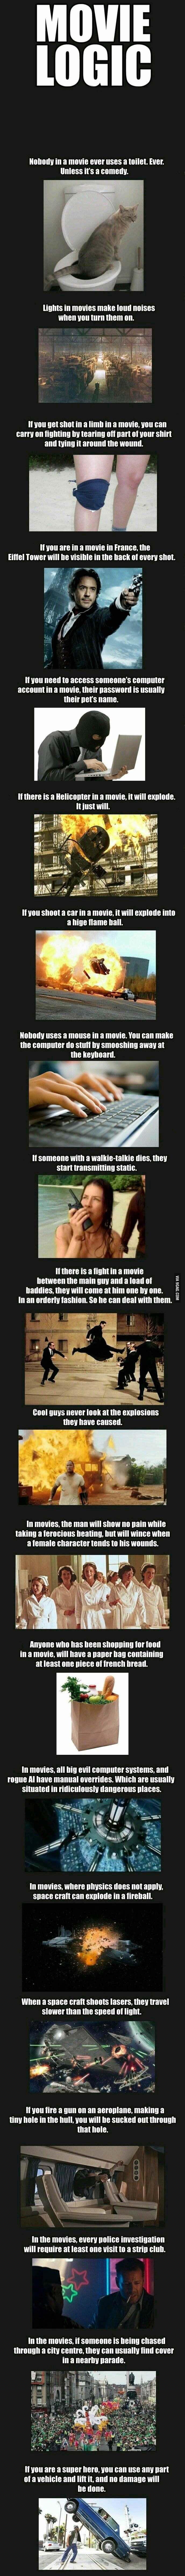 Movies Logic